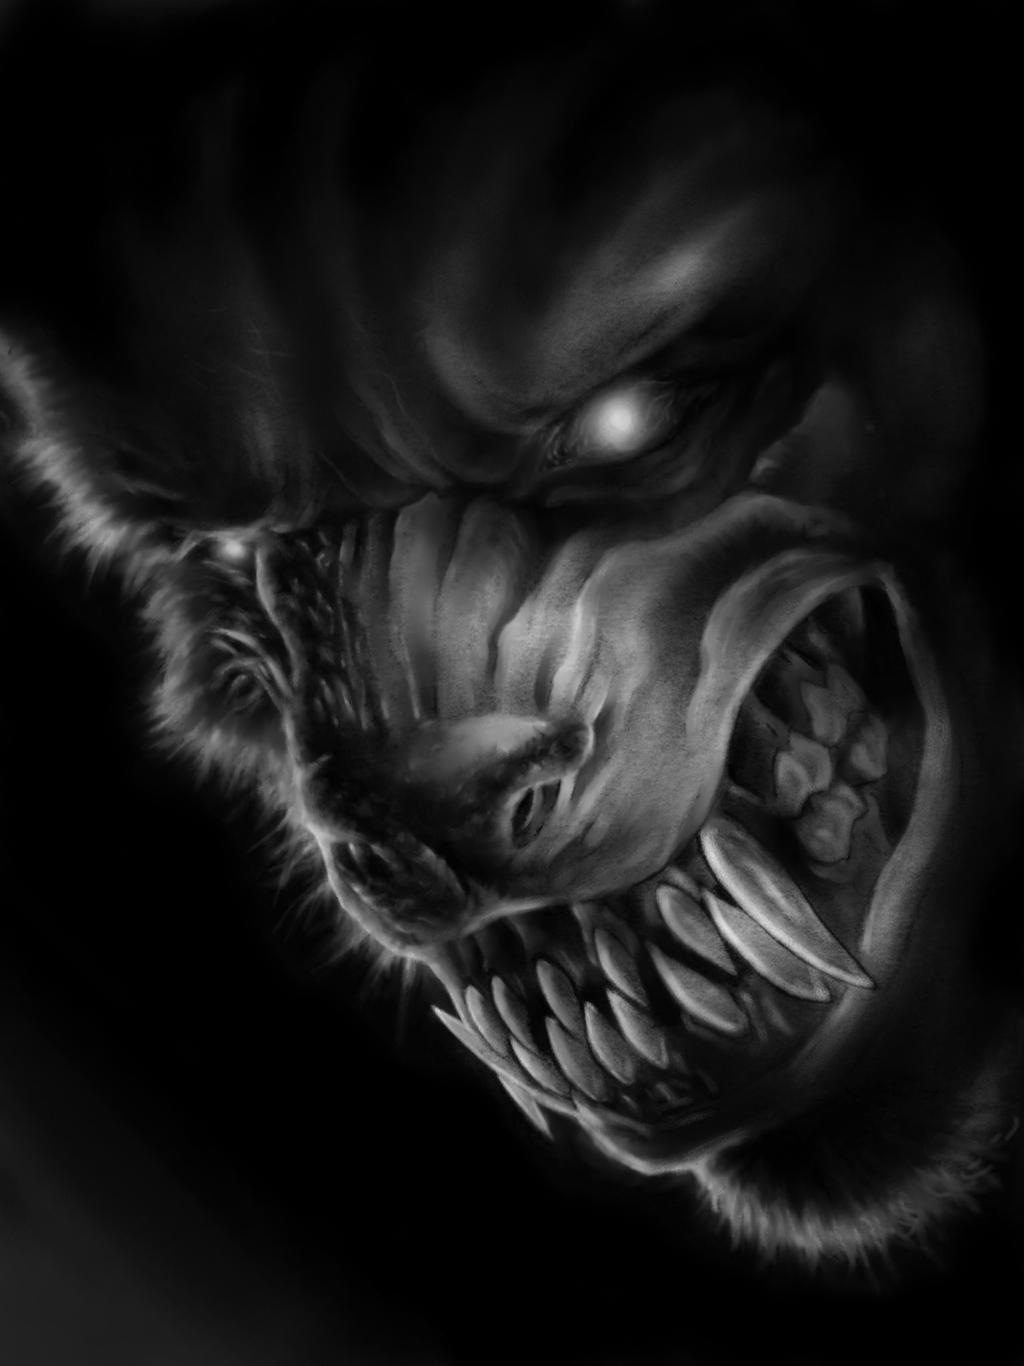 werewolf tattoo idea by spdmngtruper on DeviantArt